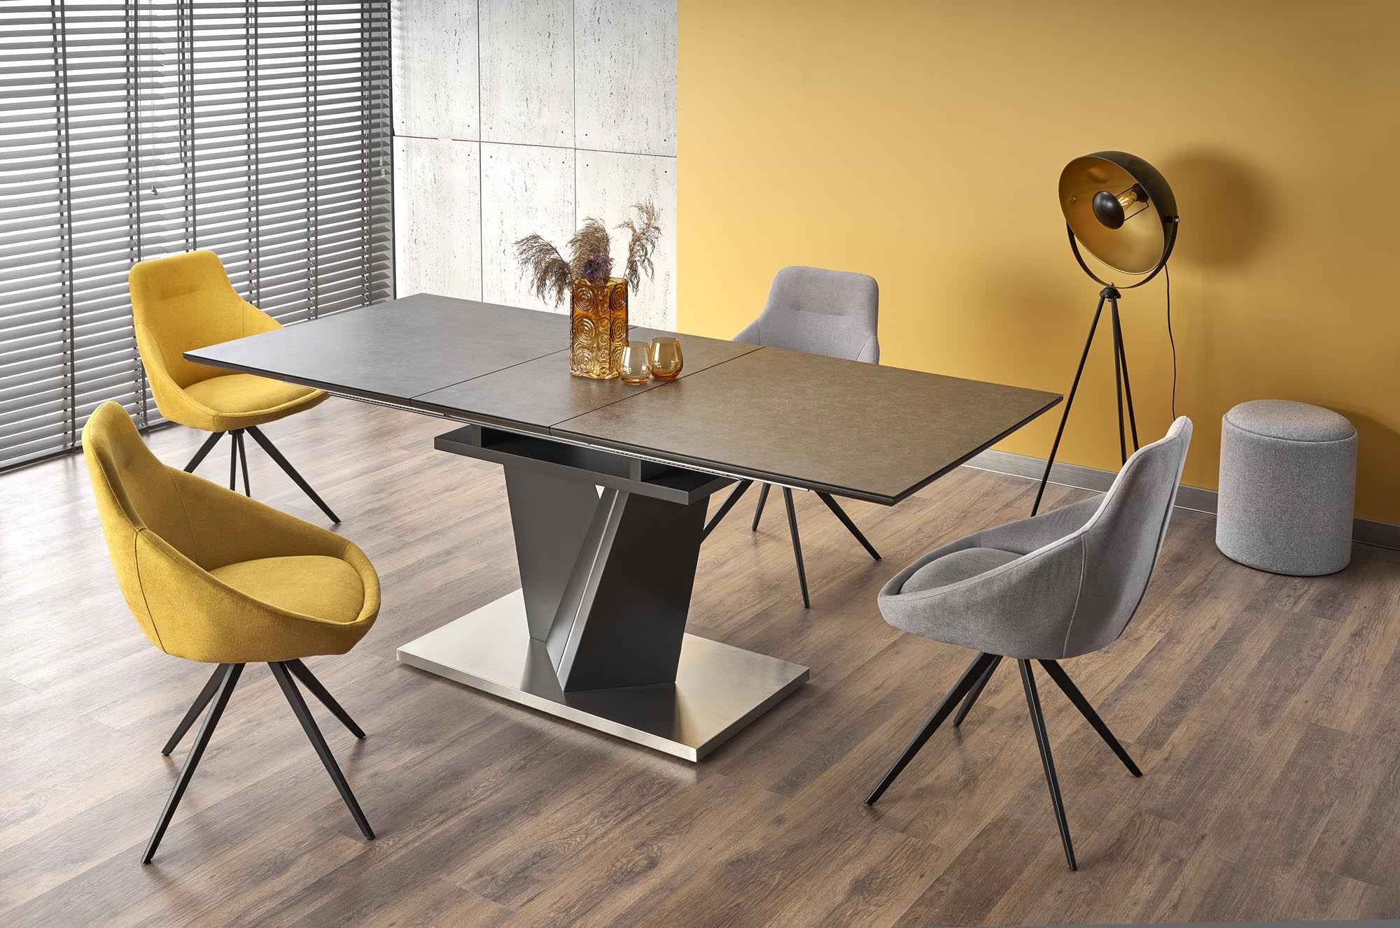 SALVADOR stół rozkładany kolor: blat - ciemny popiel, nogi - ciemny popiel